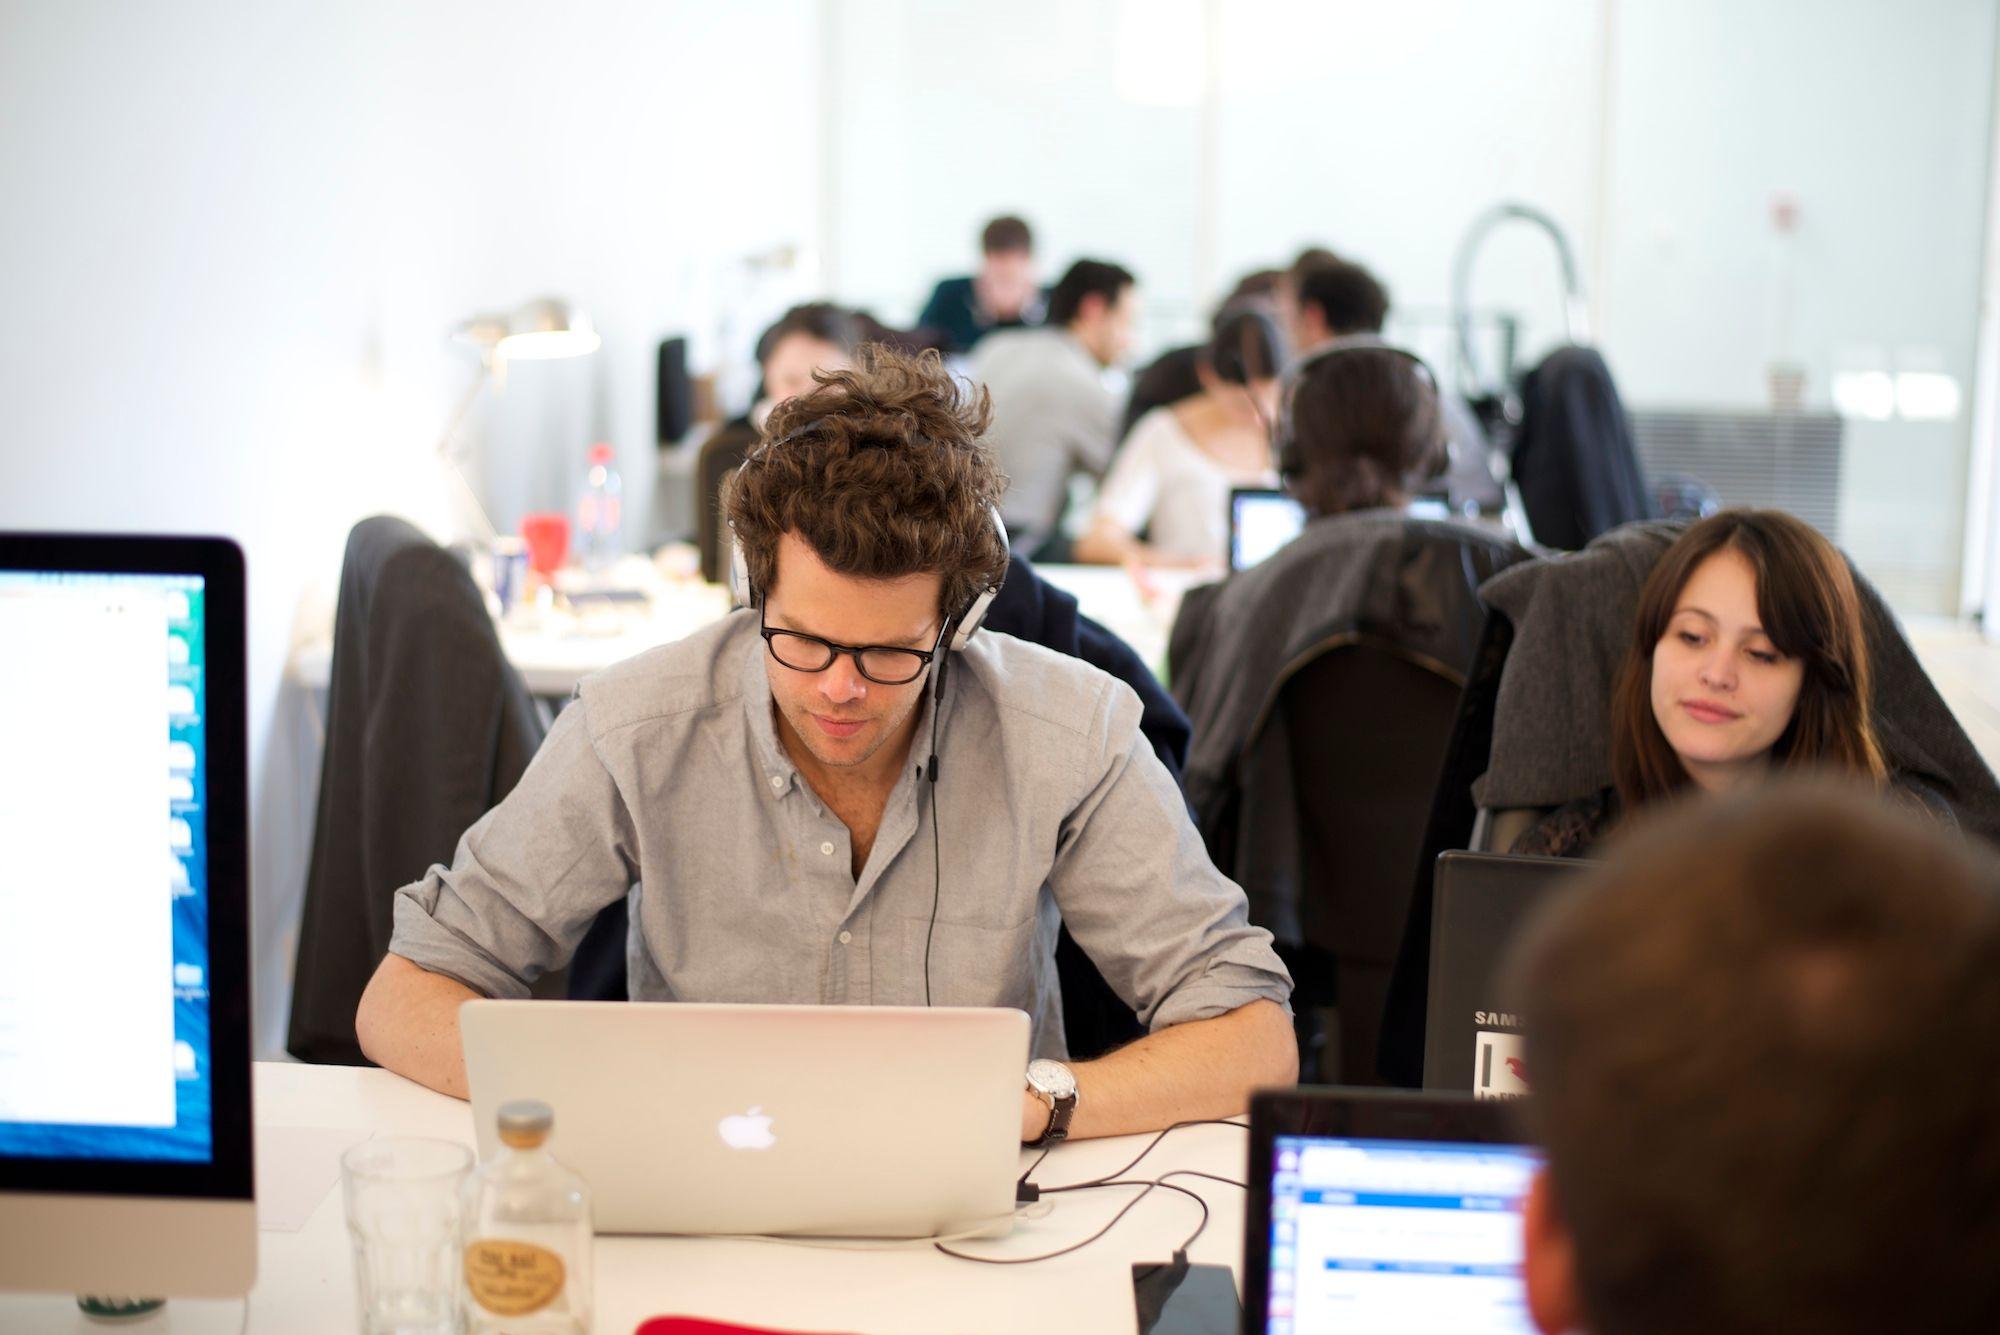 Le Wagon Belo Horizonte - Coding Bootcamp